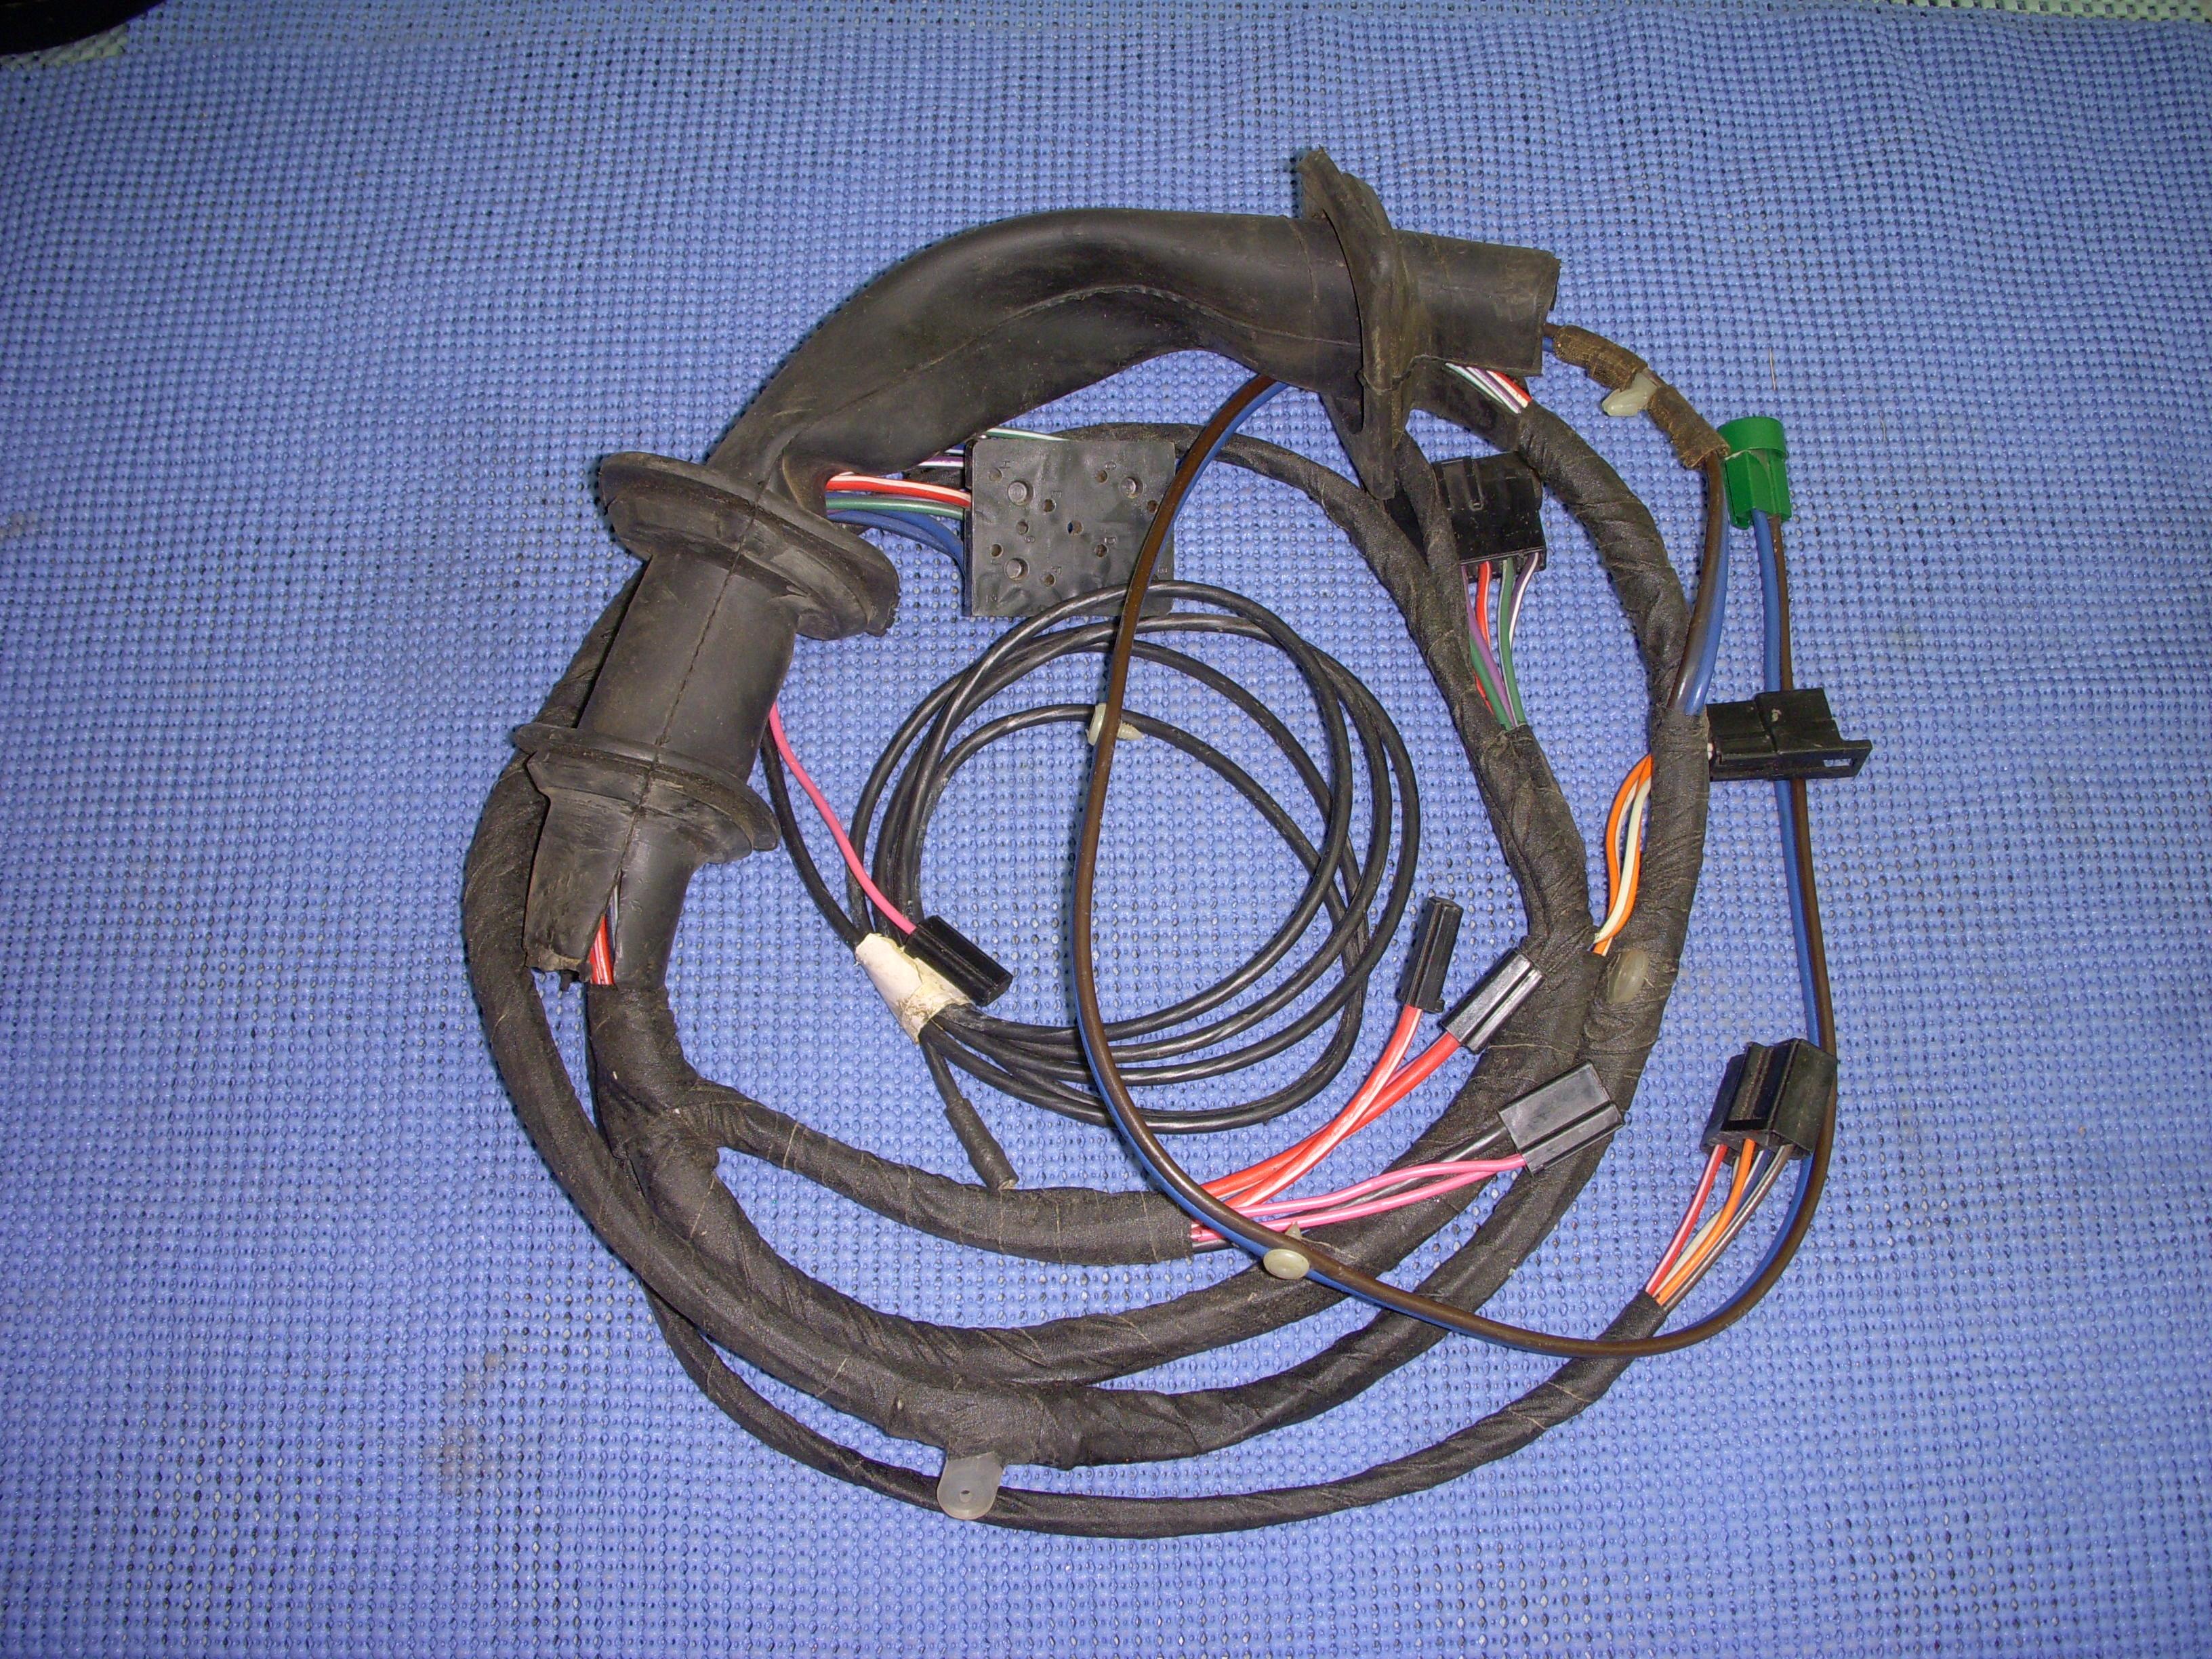 DSCN6370?resize\=300%2C300\&ssl\=1 wiring harness gm 1893623,harness \u2022 limouge co  at suagrazia.org